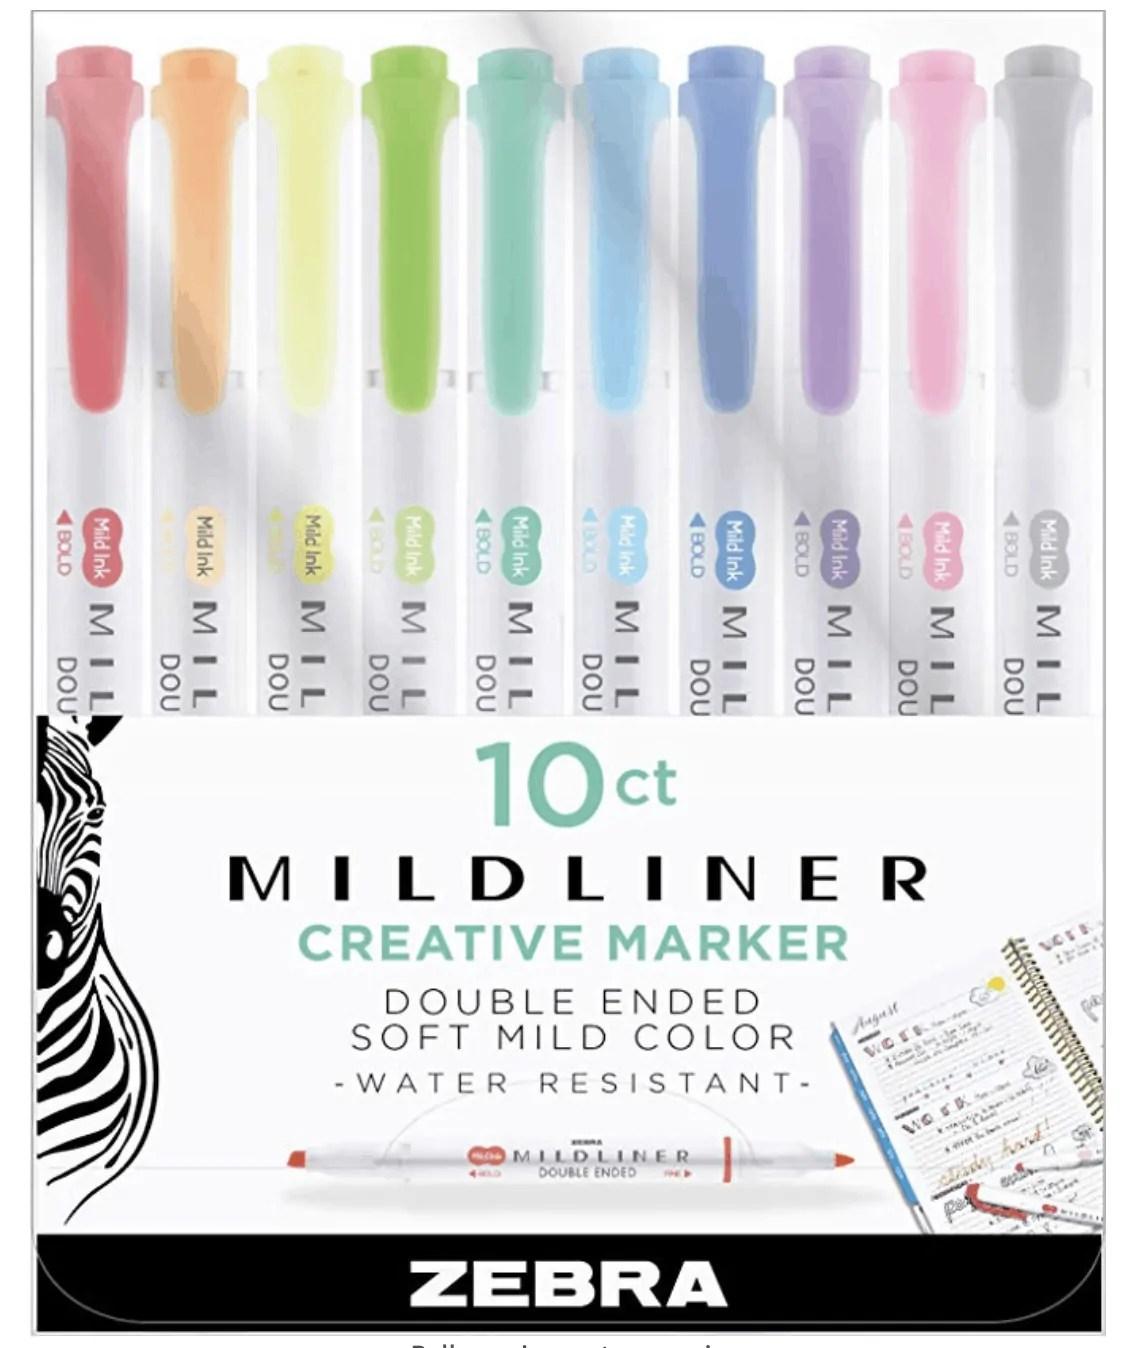 Zebra Mid-Liner Highlighters